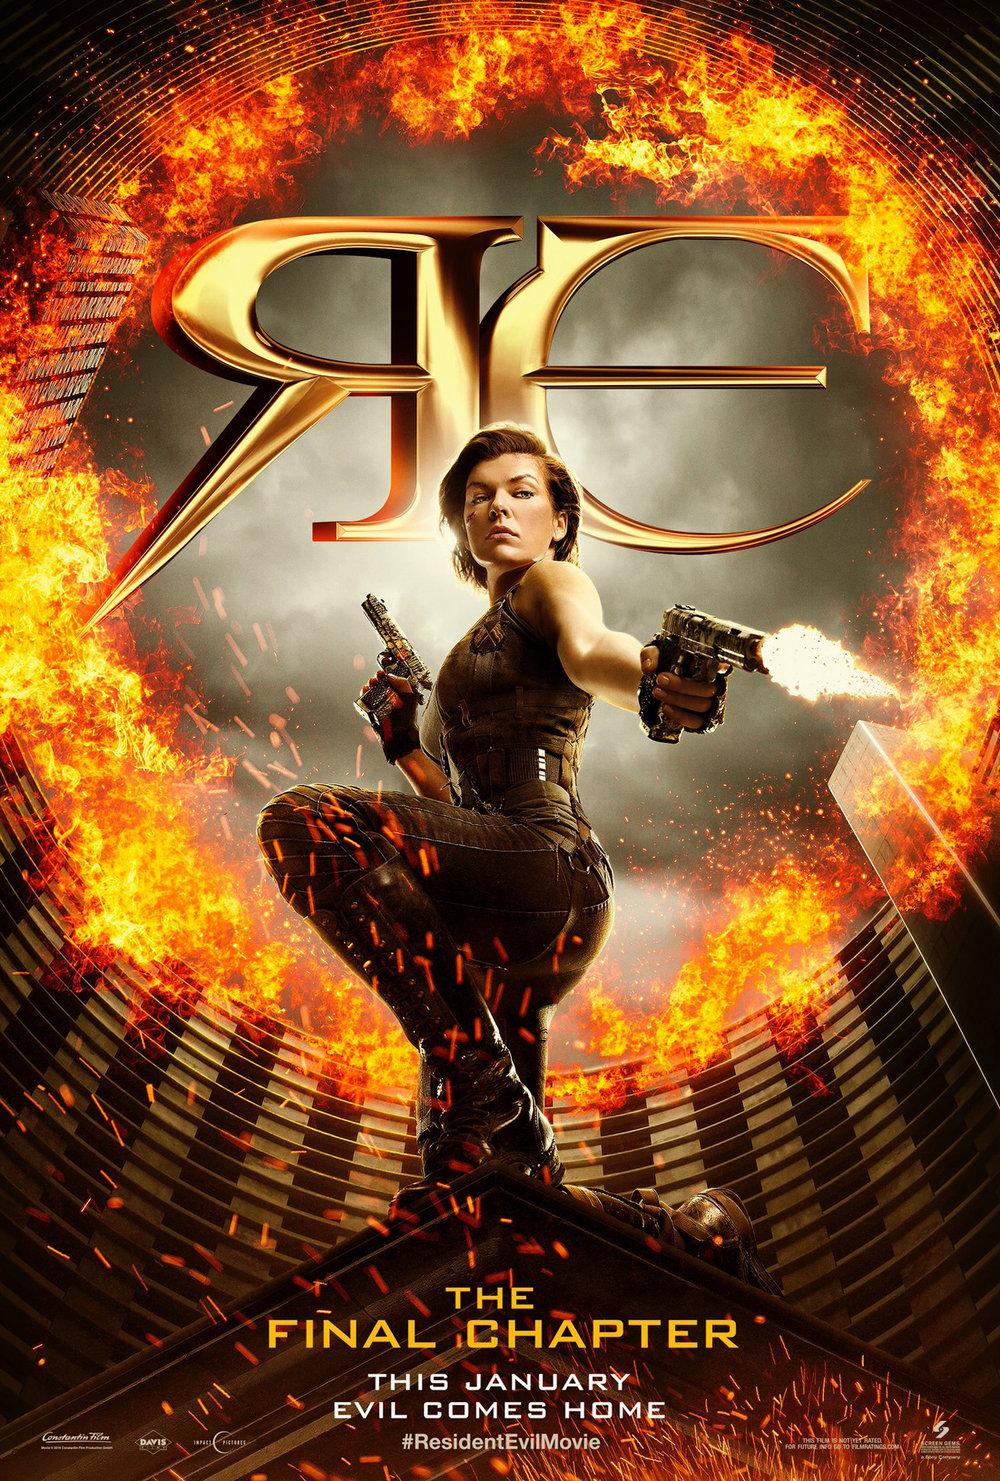 http://www.3dor2d.com/reviews/resident-evil-final-chapter